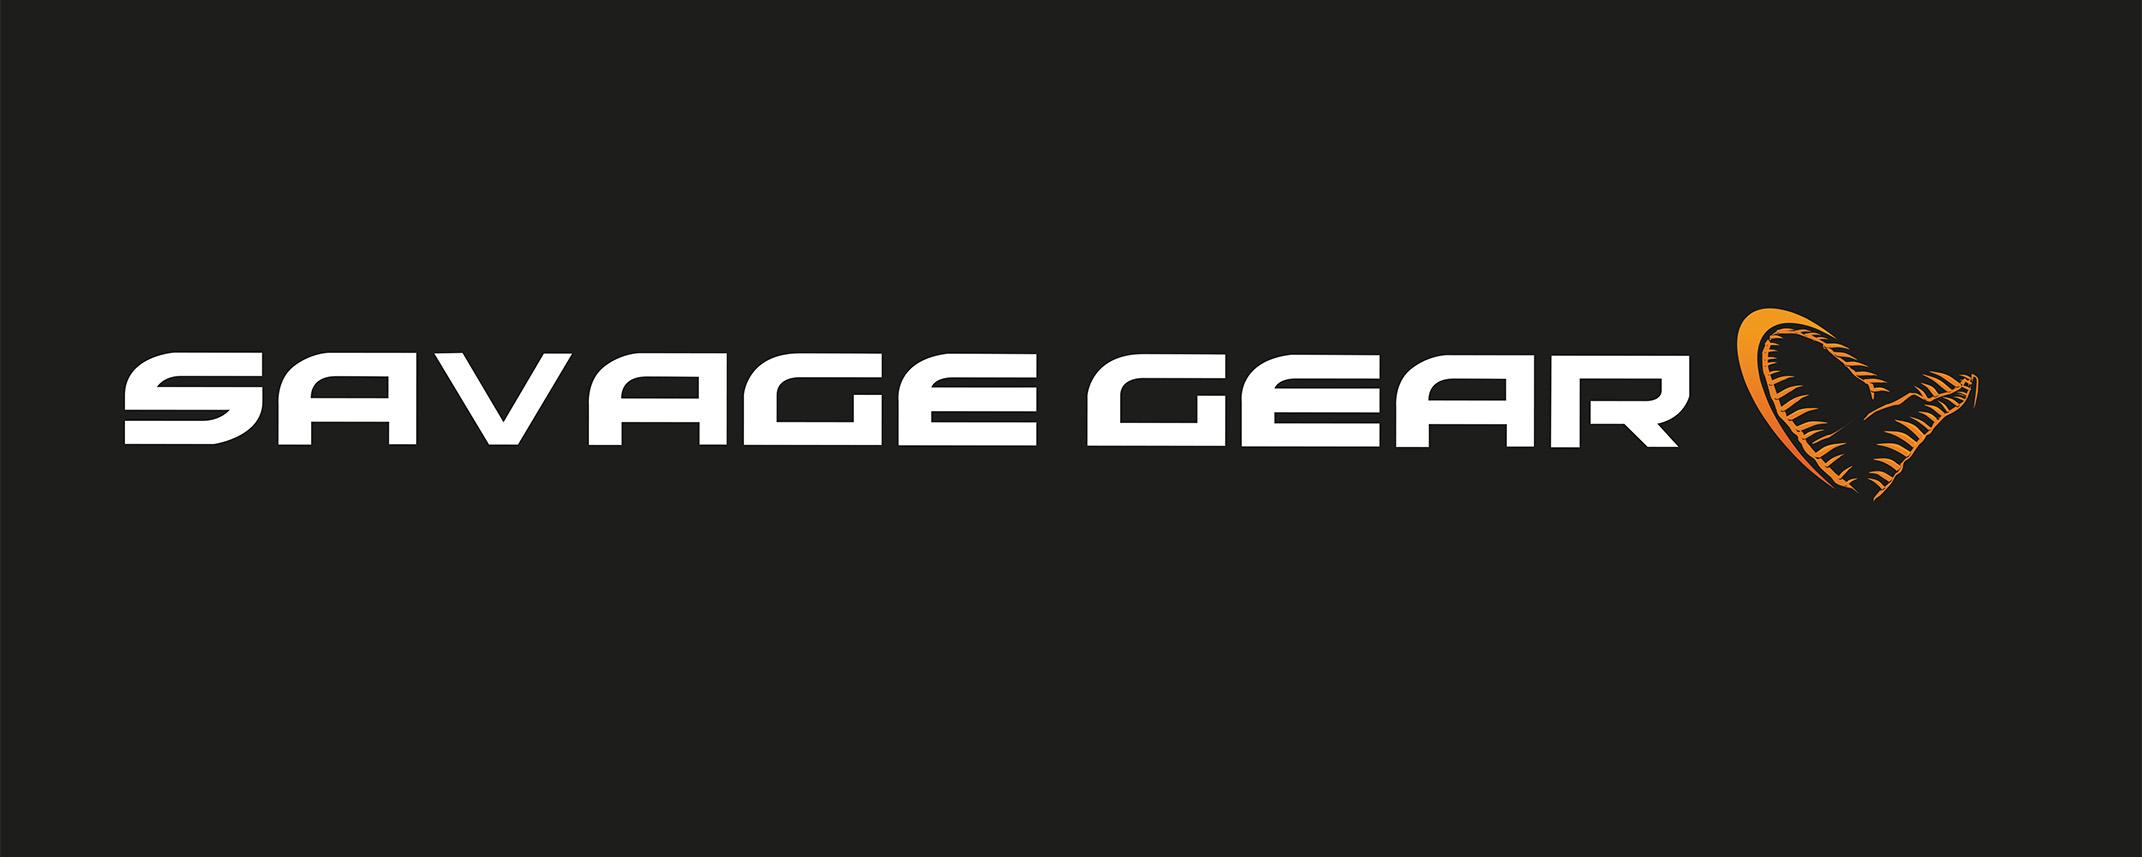 Savagegear